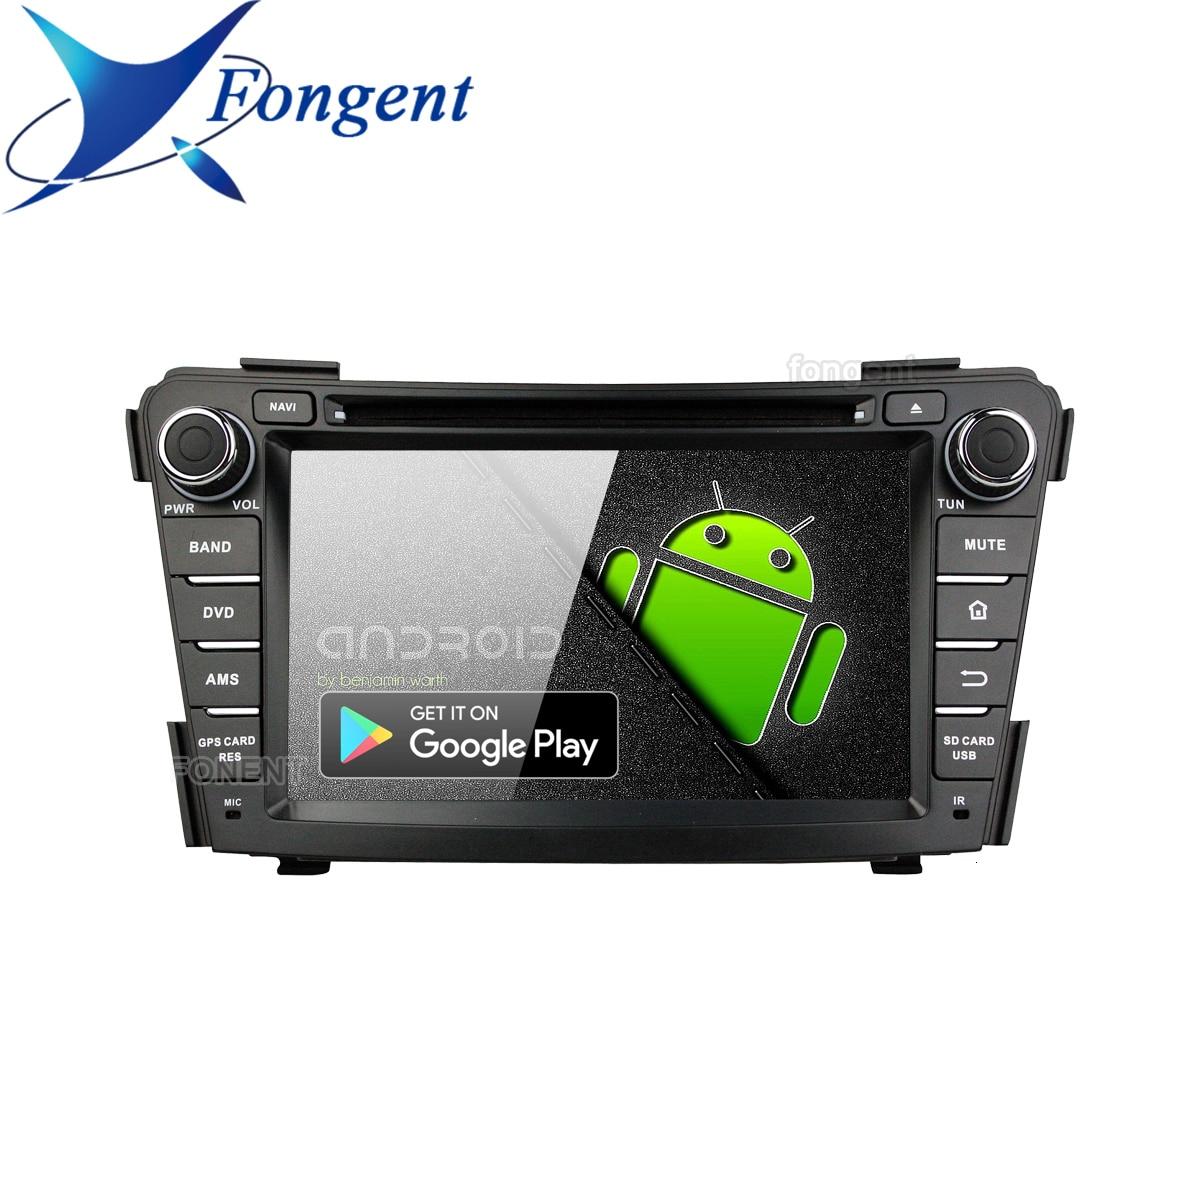 Para Hyundai I40 2011, 2012, 2013, 2014 reproductor de Dvd del coche Gps mapa Glonass Radio Rds Wifi Bluetooth 4,2 2din Android 9,0 Octa Core 64g